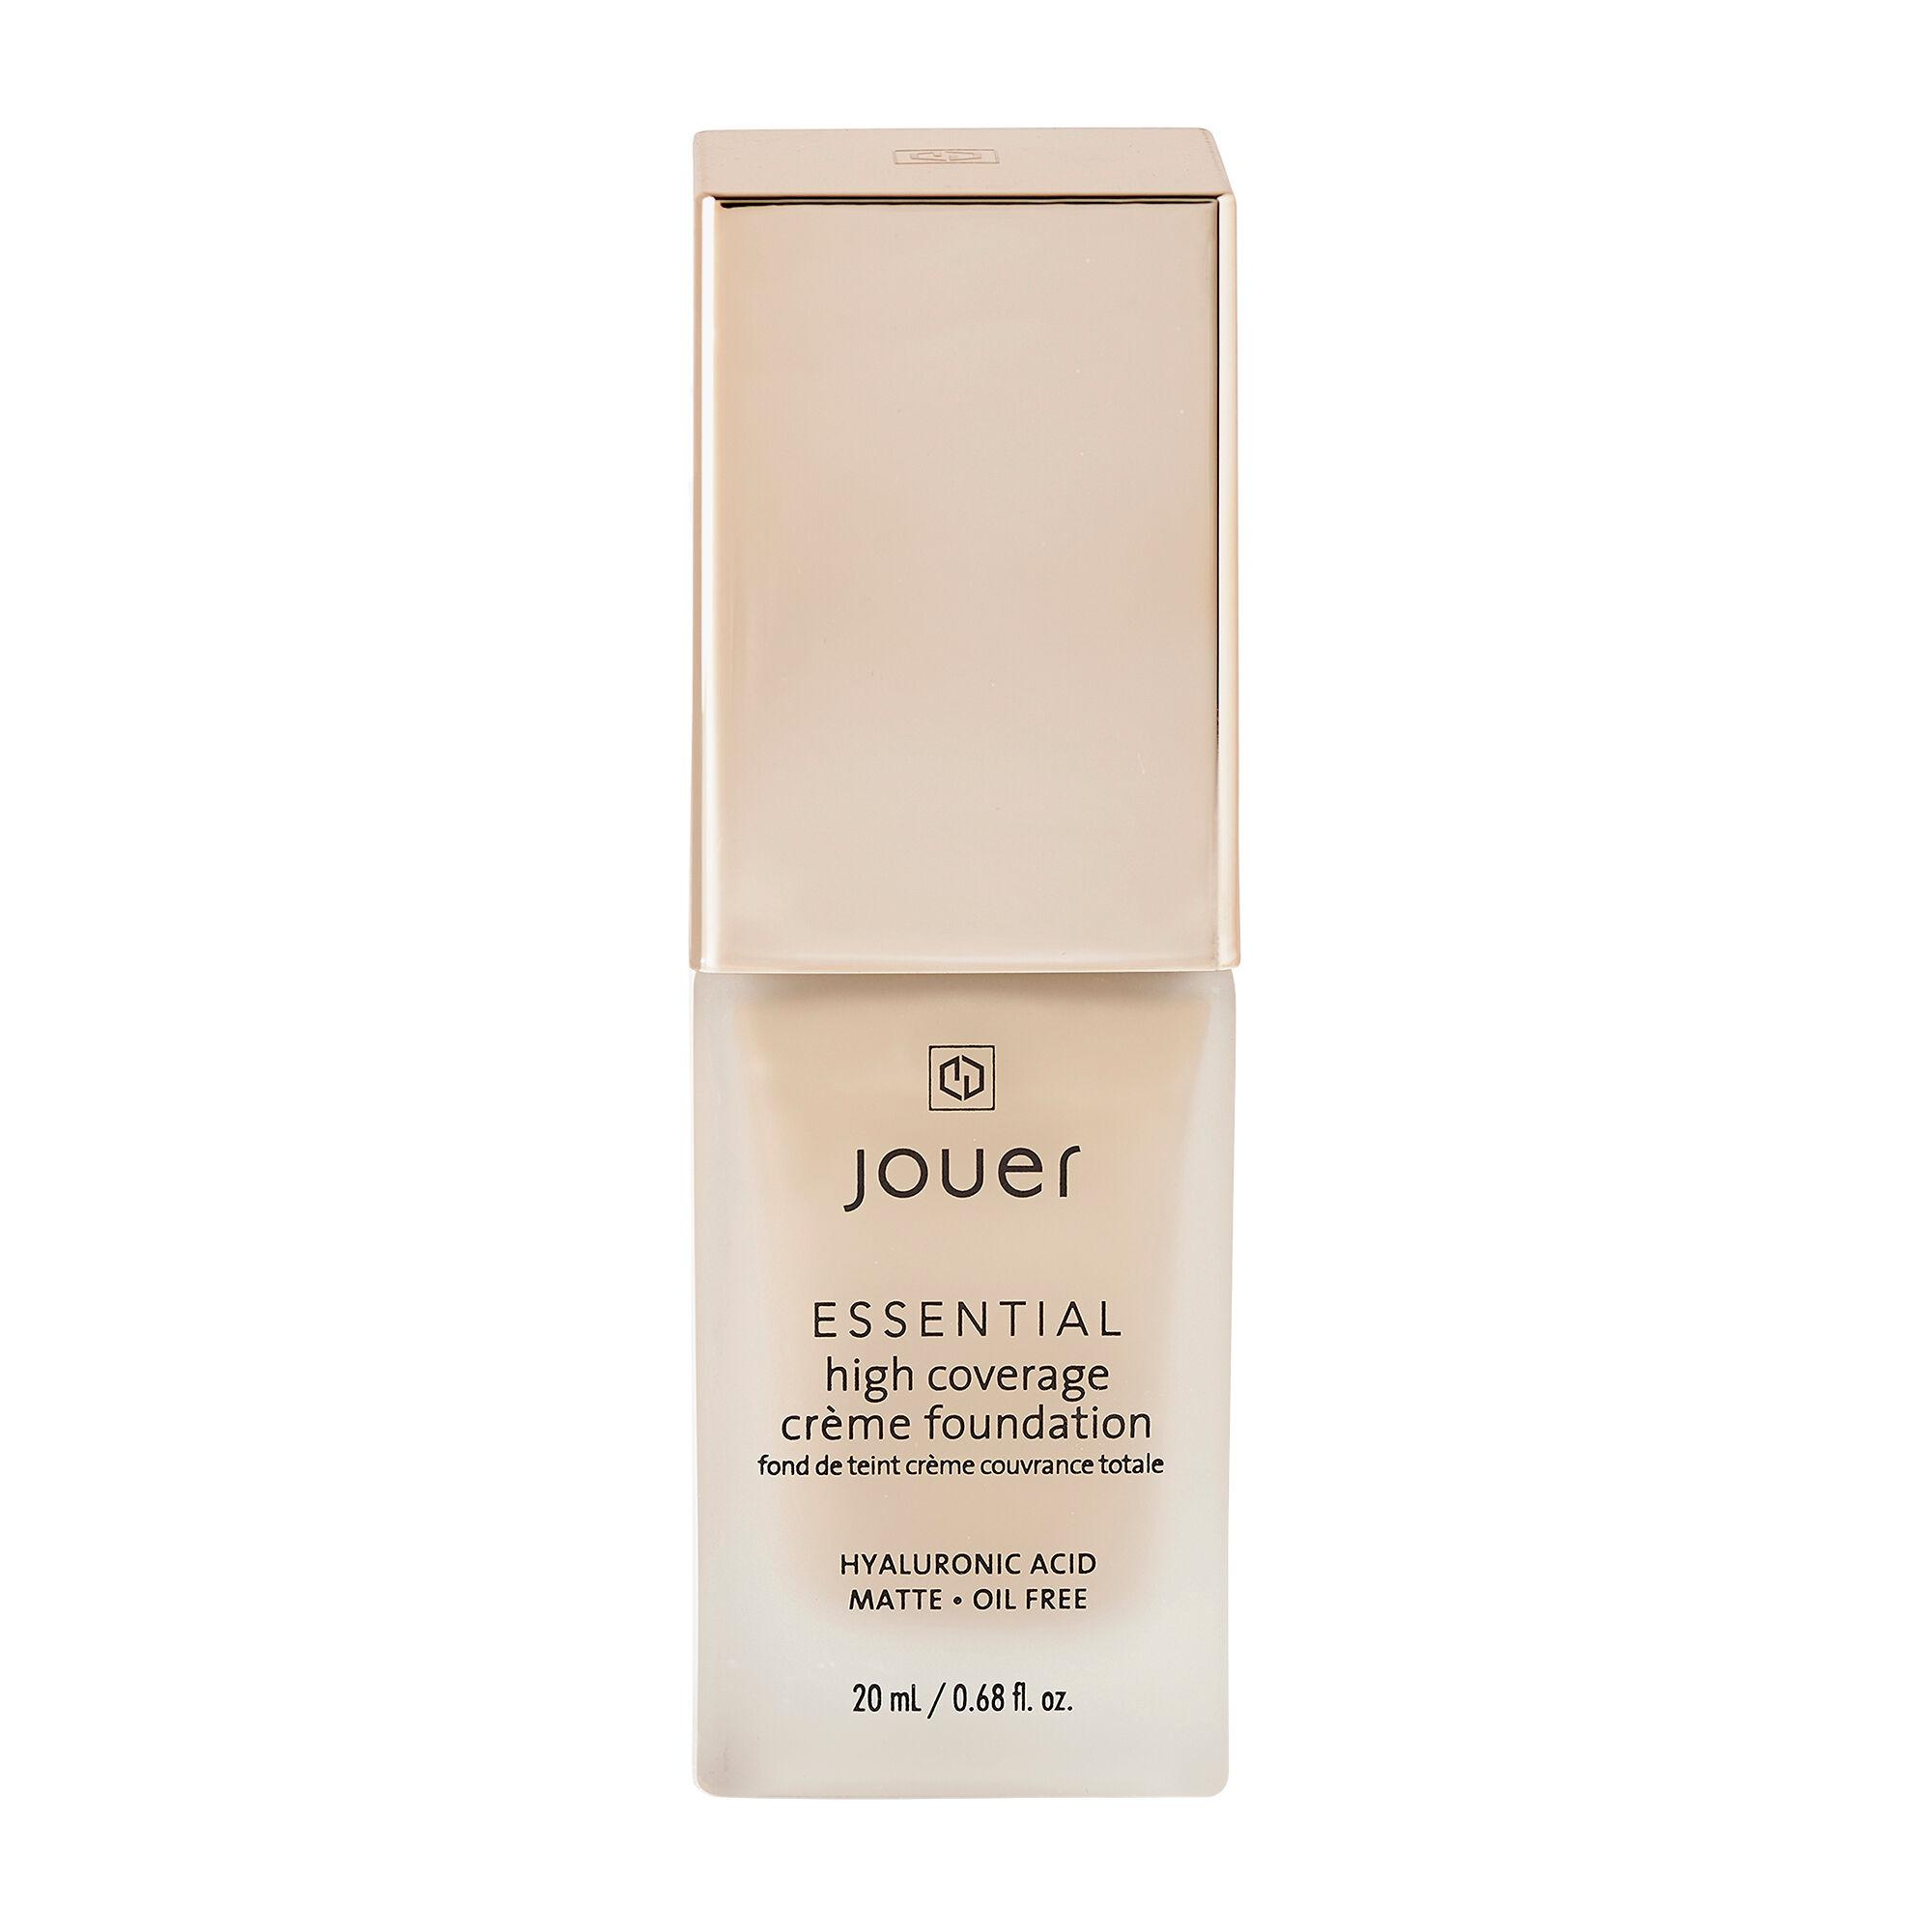 Jouer Cosmetics Essential High Coverage Creme Foundation Honey Beige 20ml